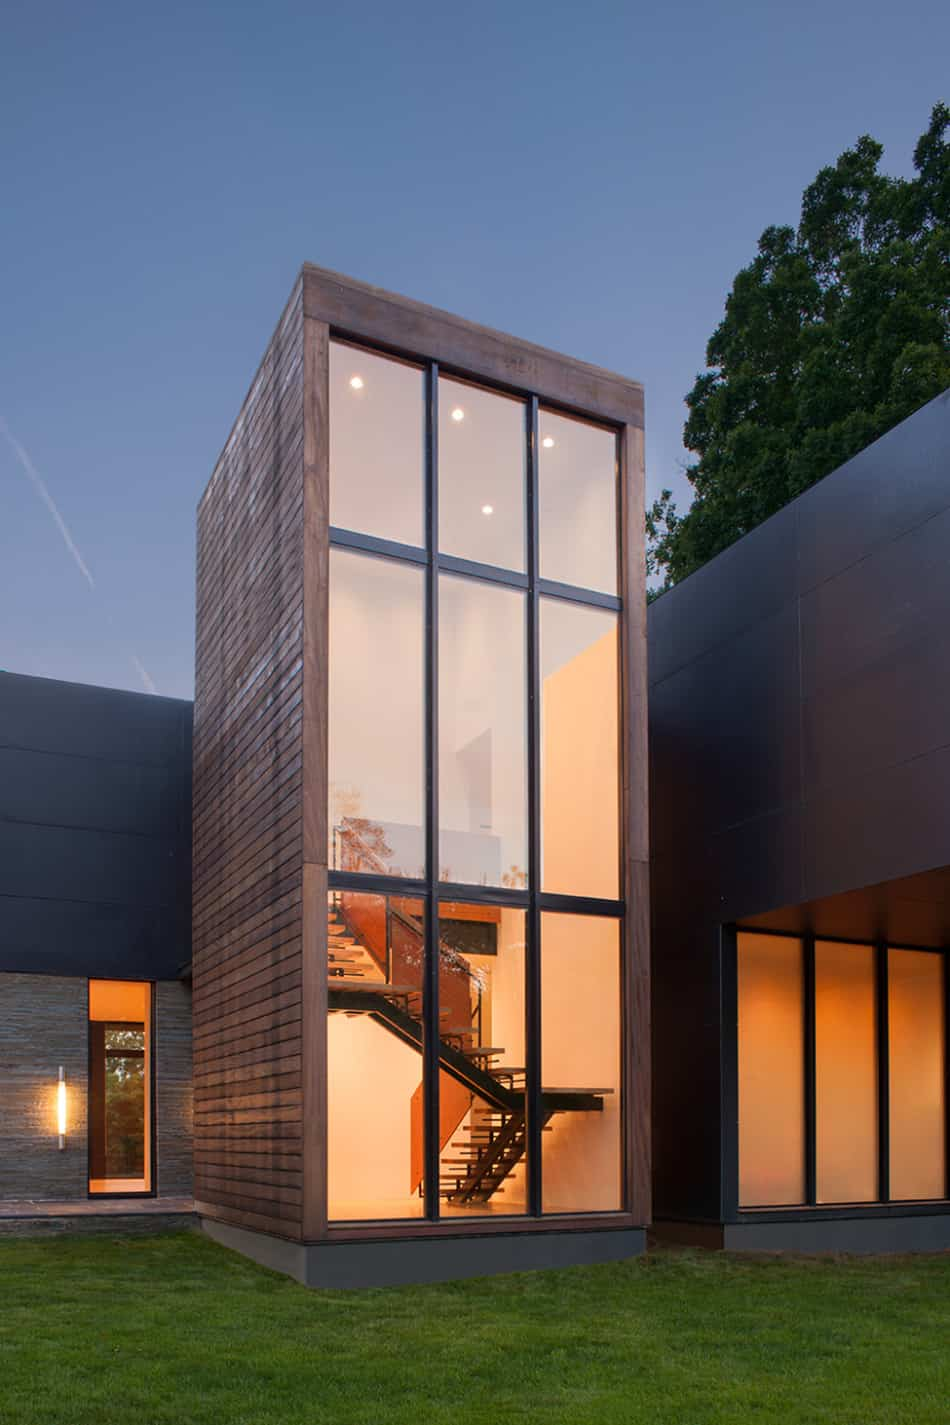 Modern Box House with Interior Glass Bridges | Modern ... on Glass House Design Ideas  id=45493